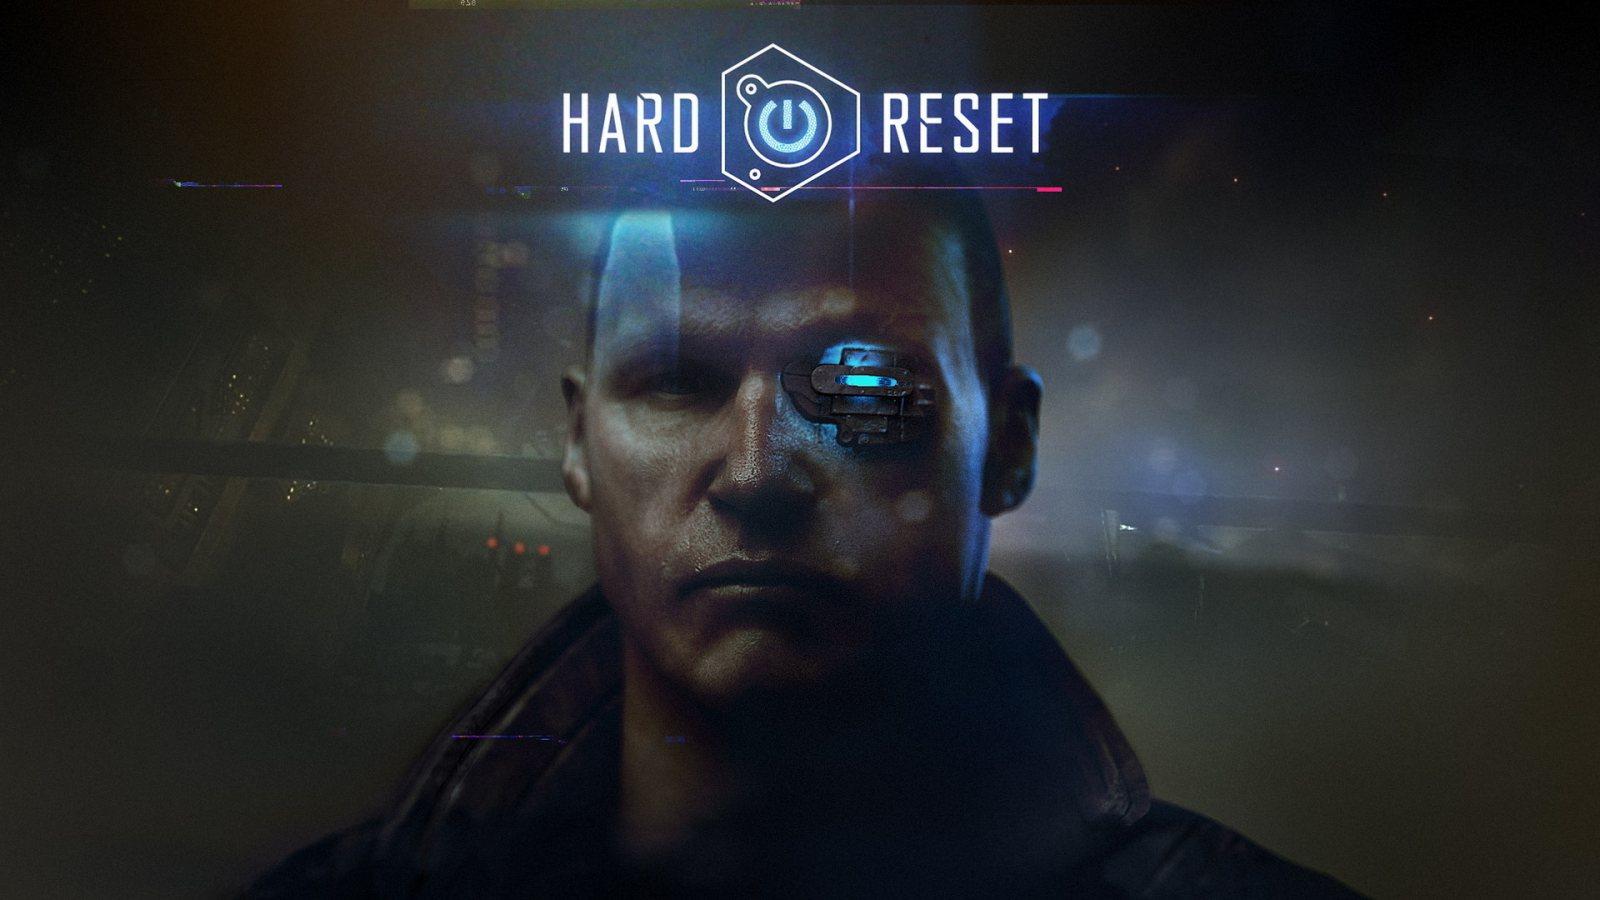 Hard Reset - Wallpapers